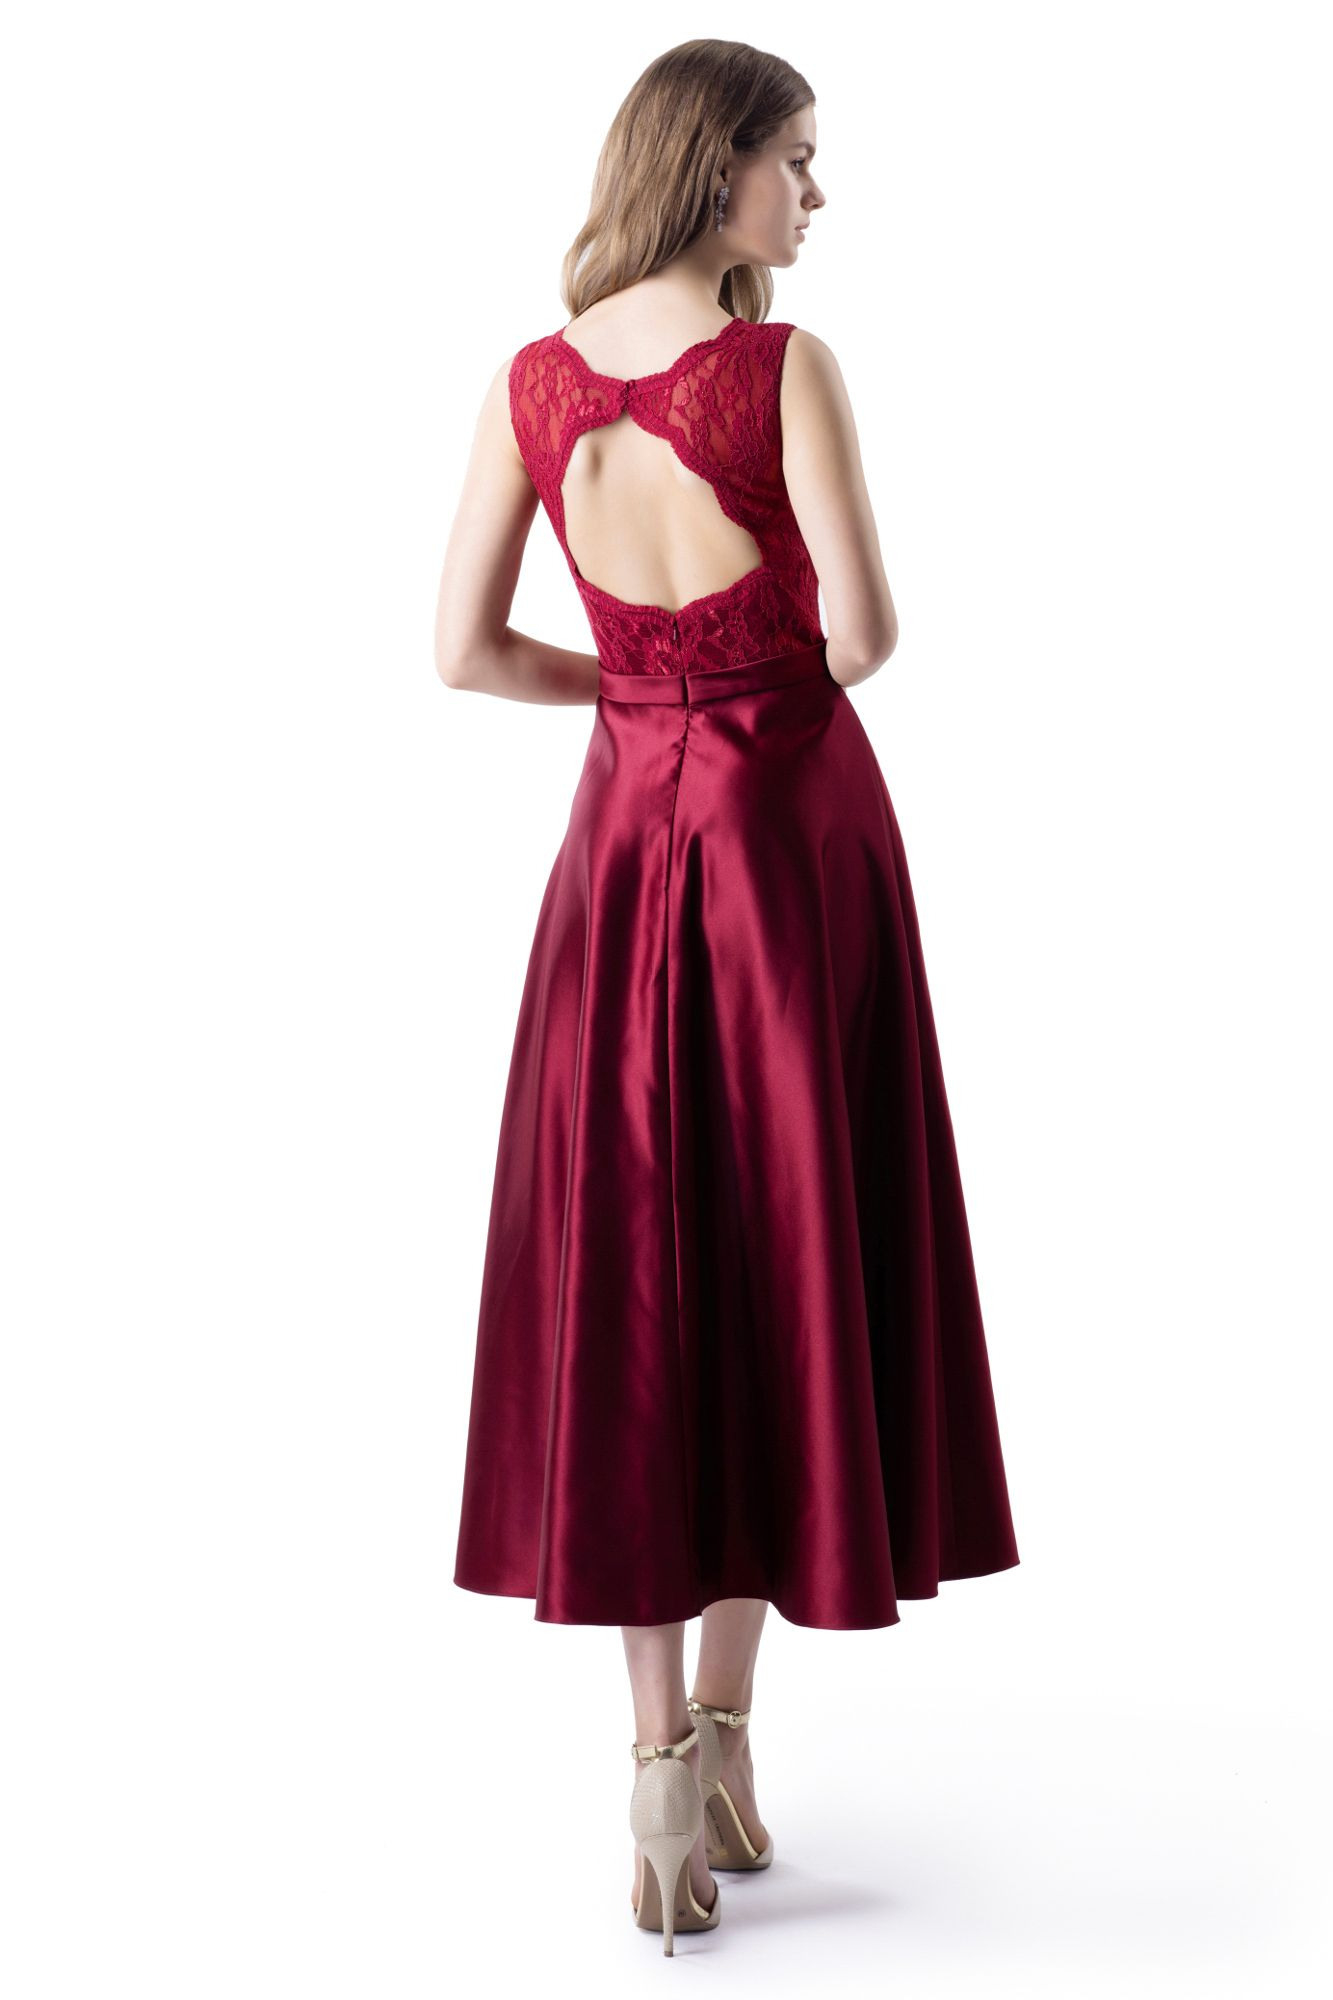 15 Top Dunkelrotes Abendkleid Design17 Genial Dunkelrotes Abendkleid Stylish